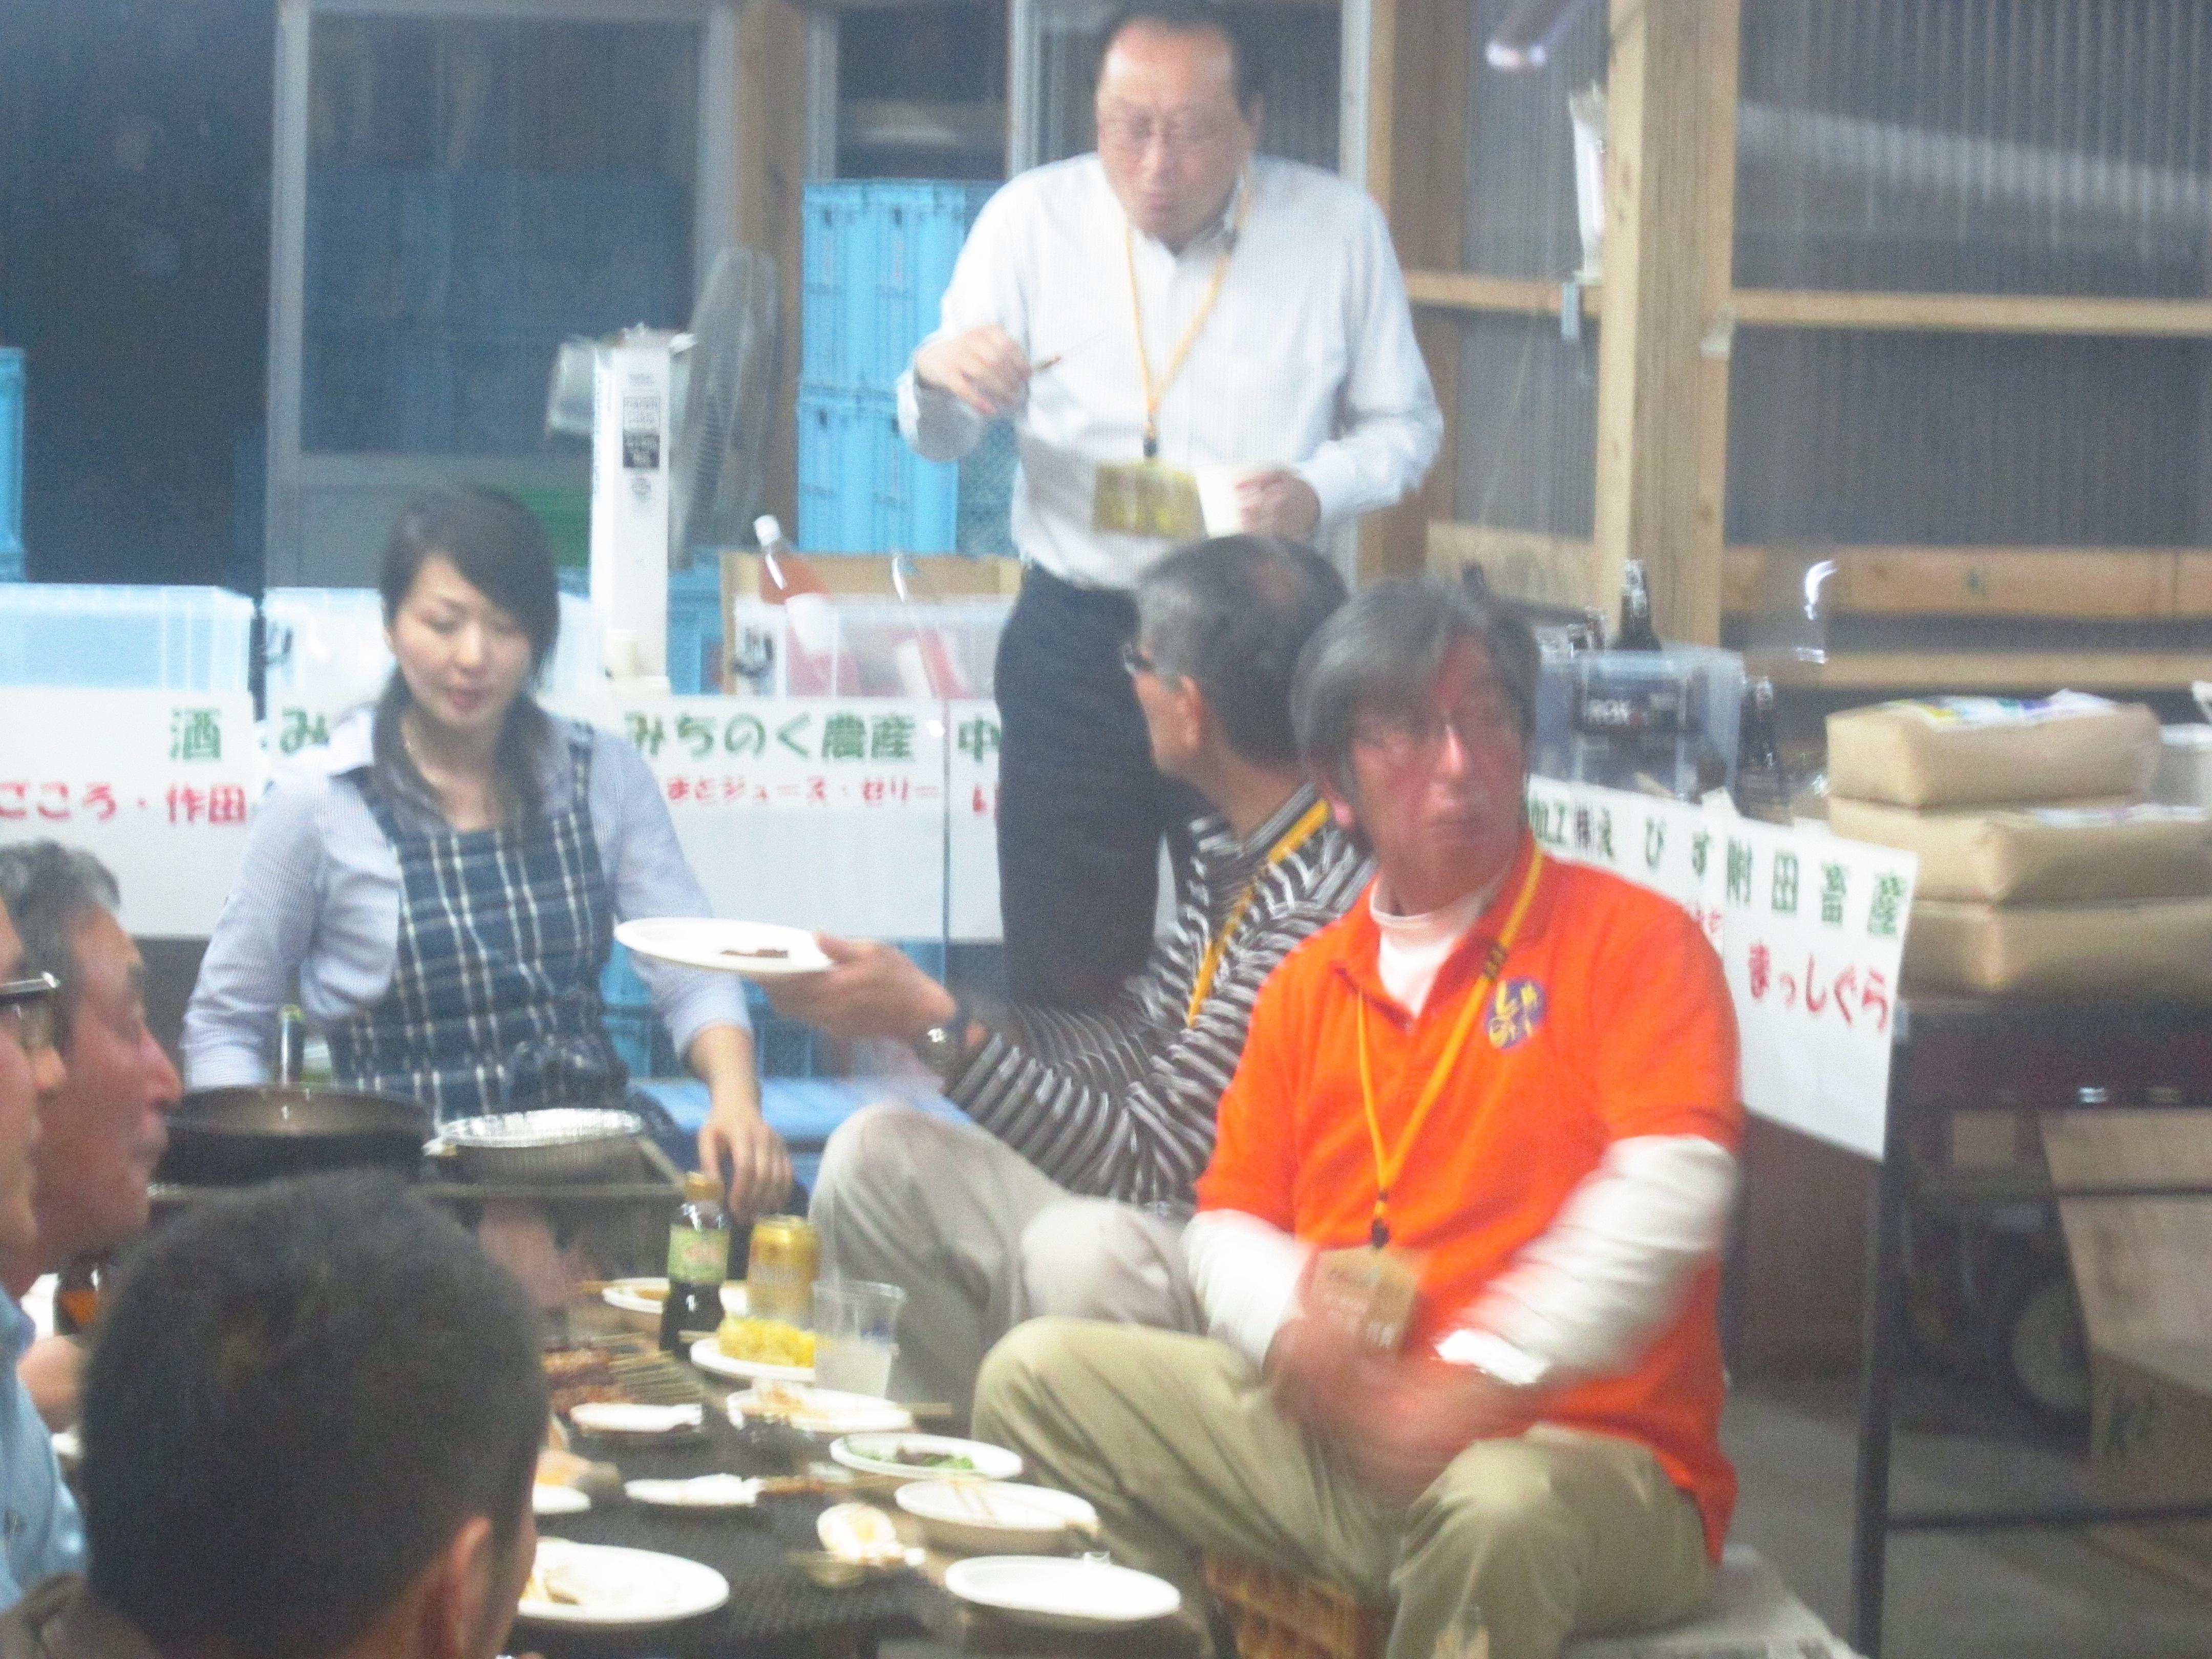 IMG 4364 - 麻布十番納涼祭り25,26日(七戸町出店)